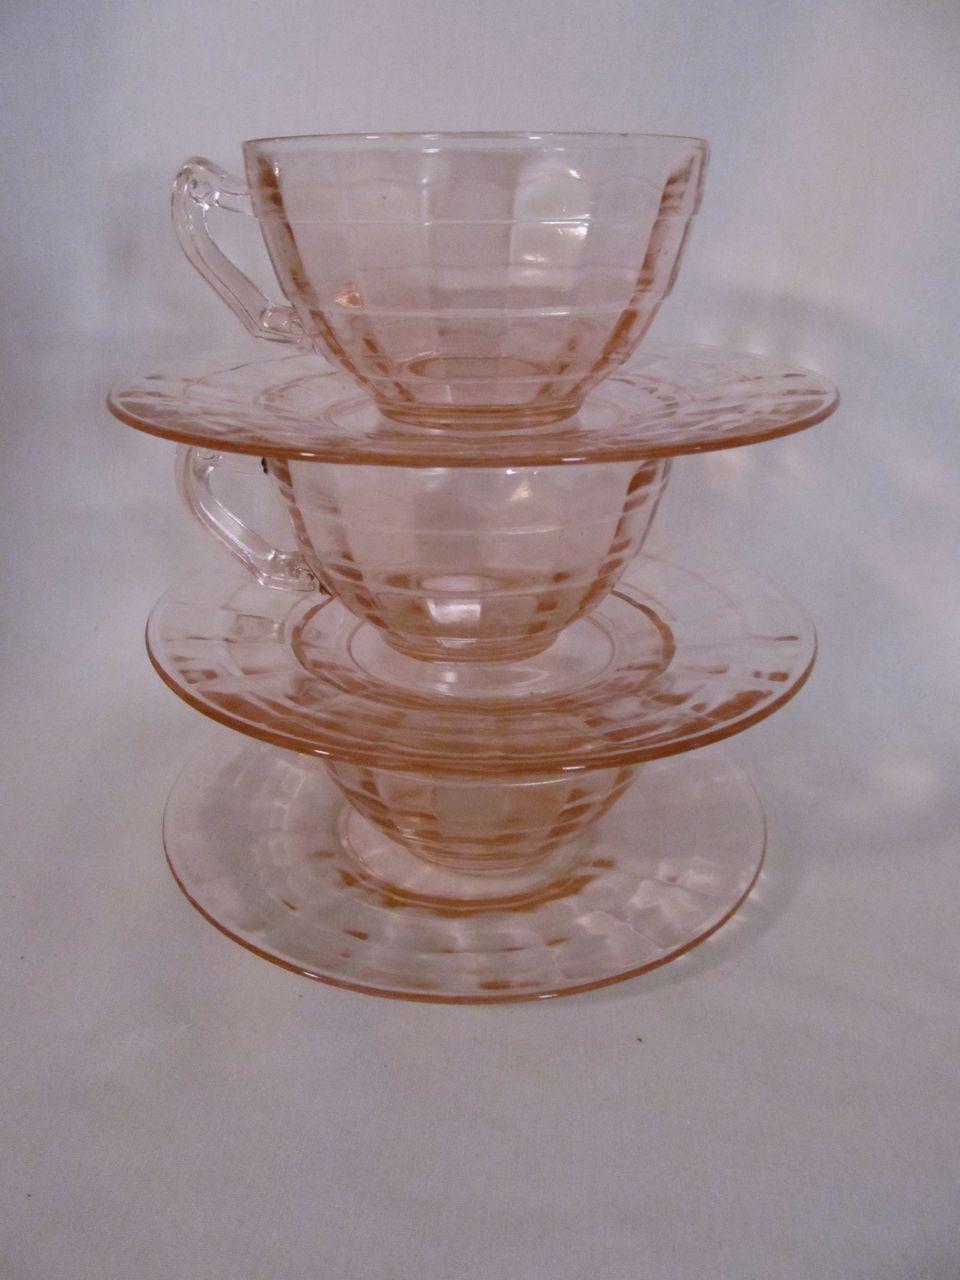 3 Hocking Pink Block Optic Cups & Saucers